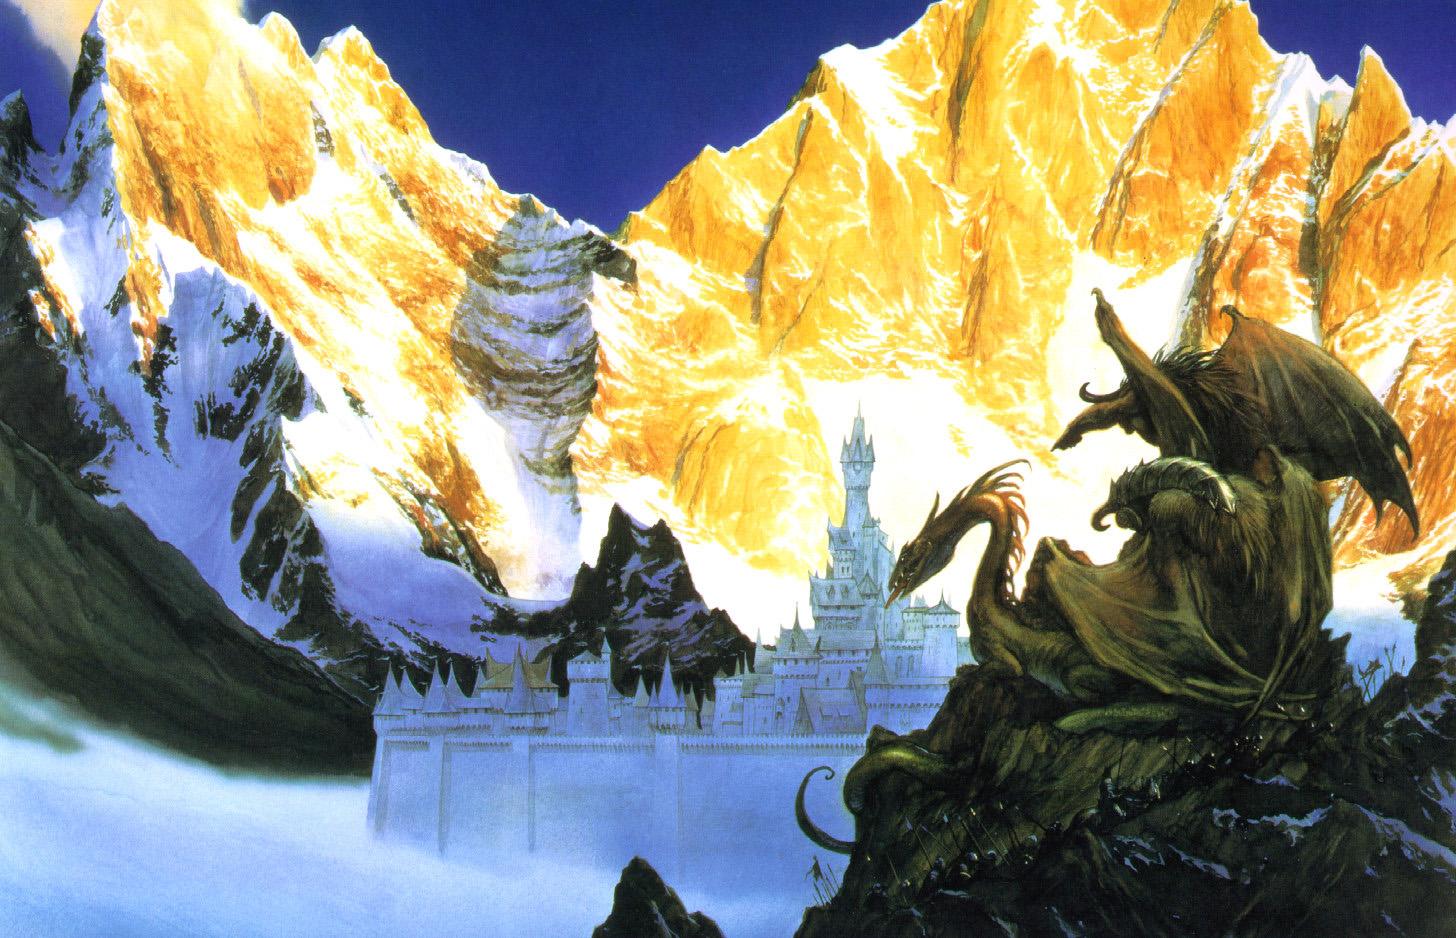 http://www.nasha-lavochka.ru/images/john_howe/morgoths_forces.jpg